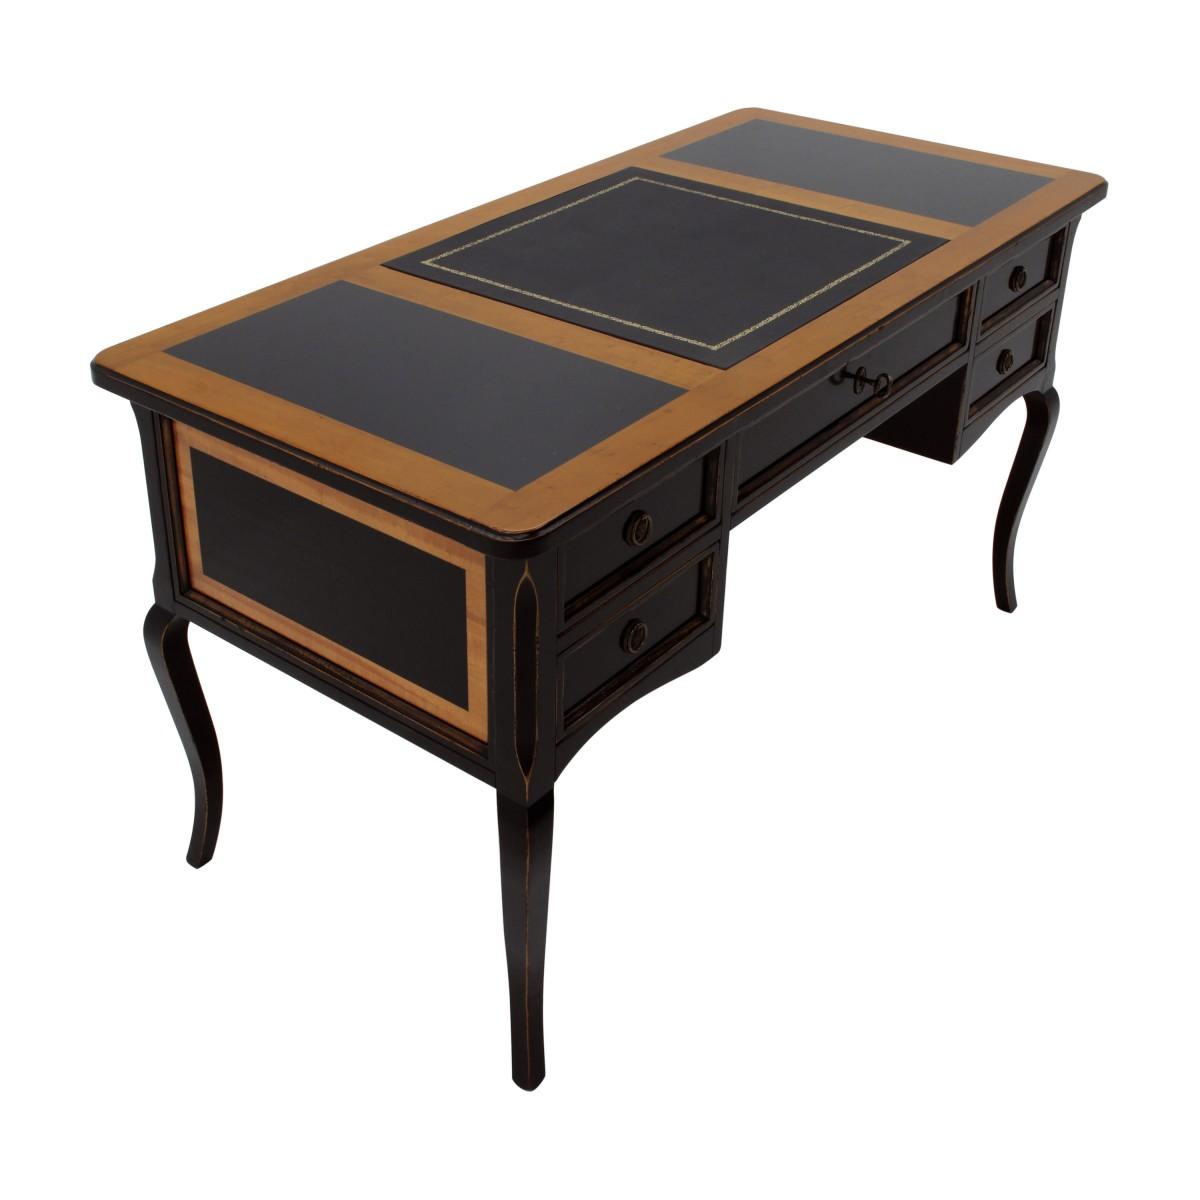 italian classic writing desk perseo 4 2431